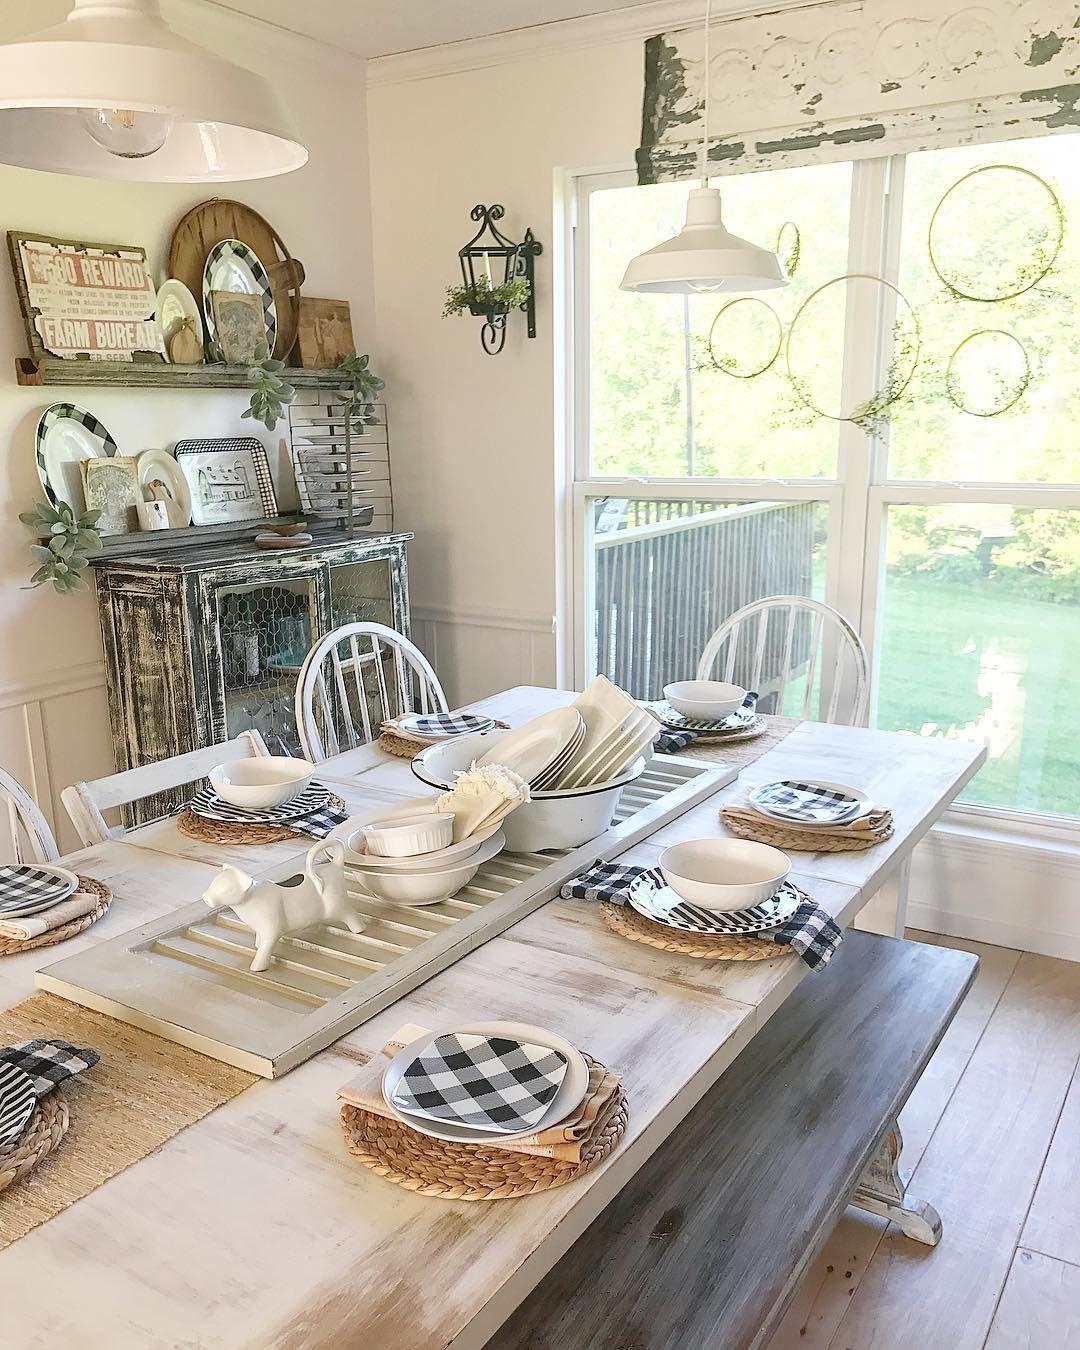 Pin By Melissa Landsverk-Johnson On Home Ideas: Furnishing